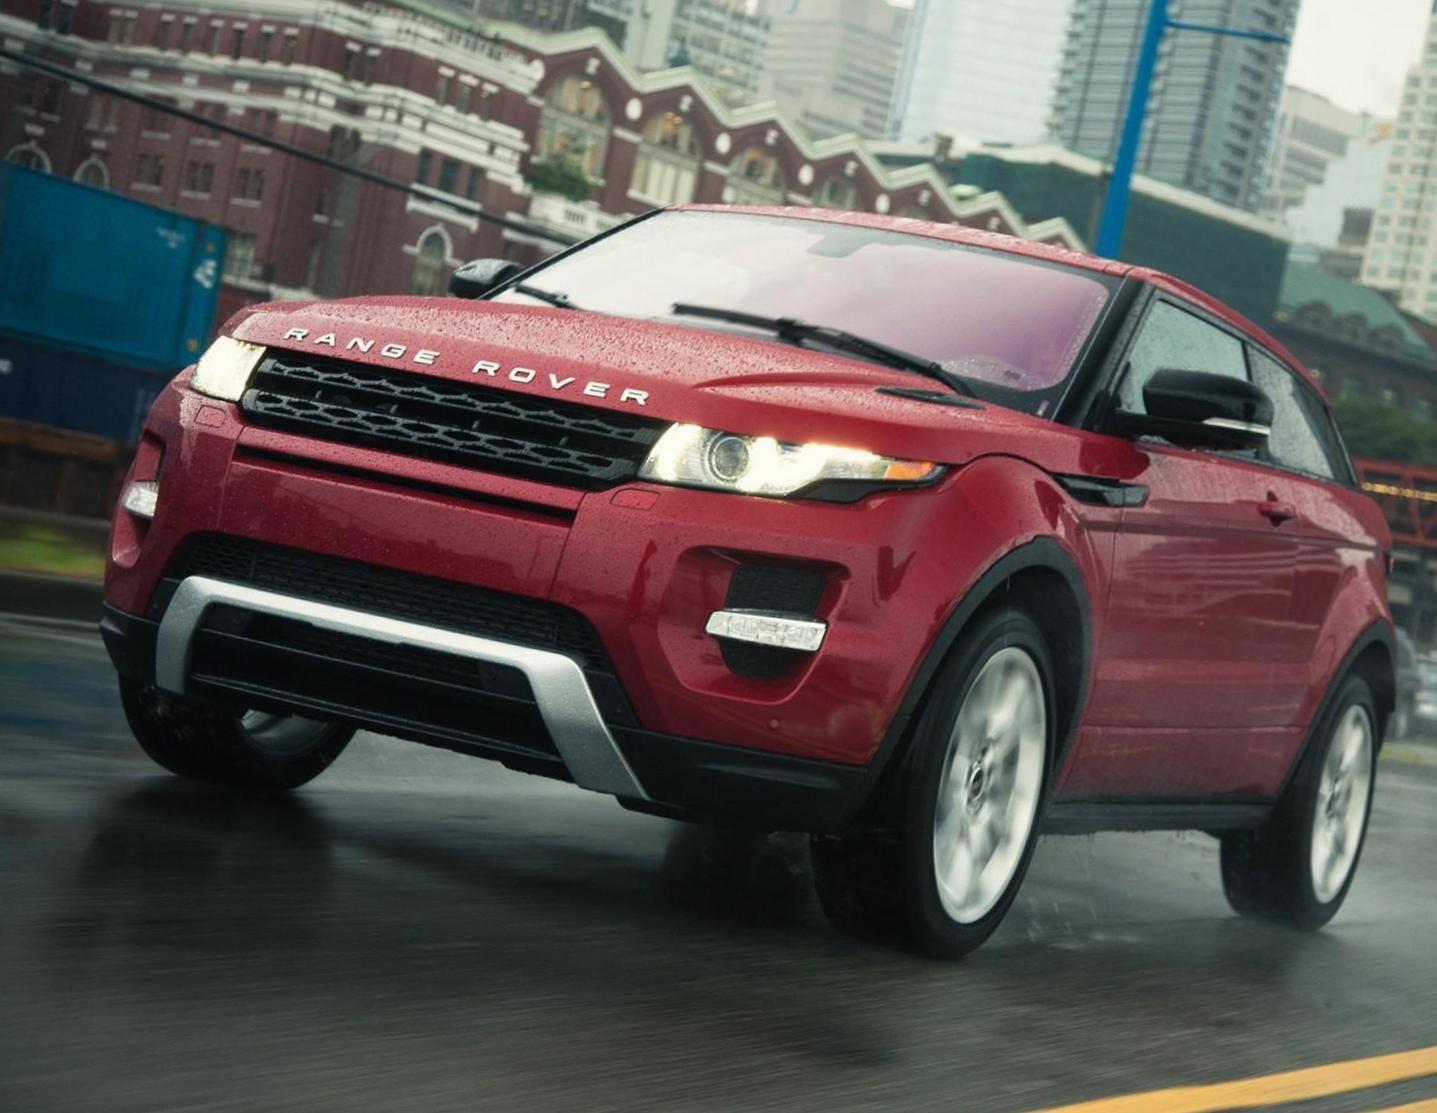 Land Rover Range Rover Evoque approved - http://autotras.com